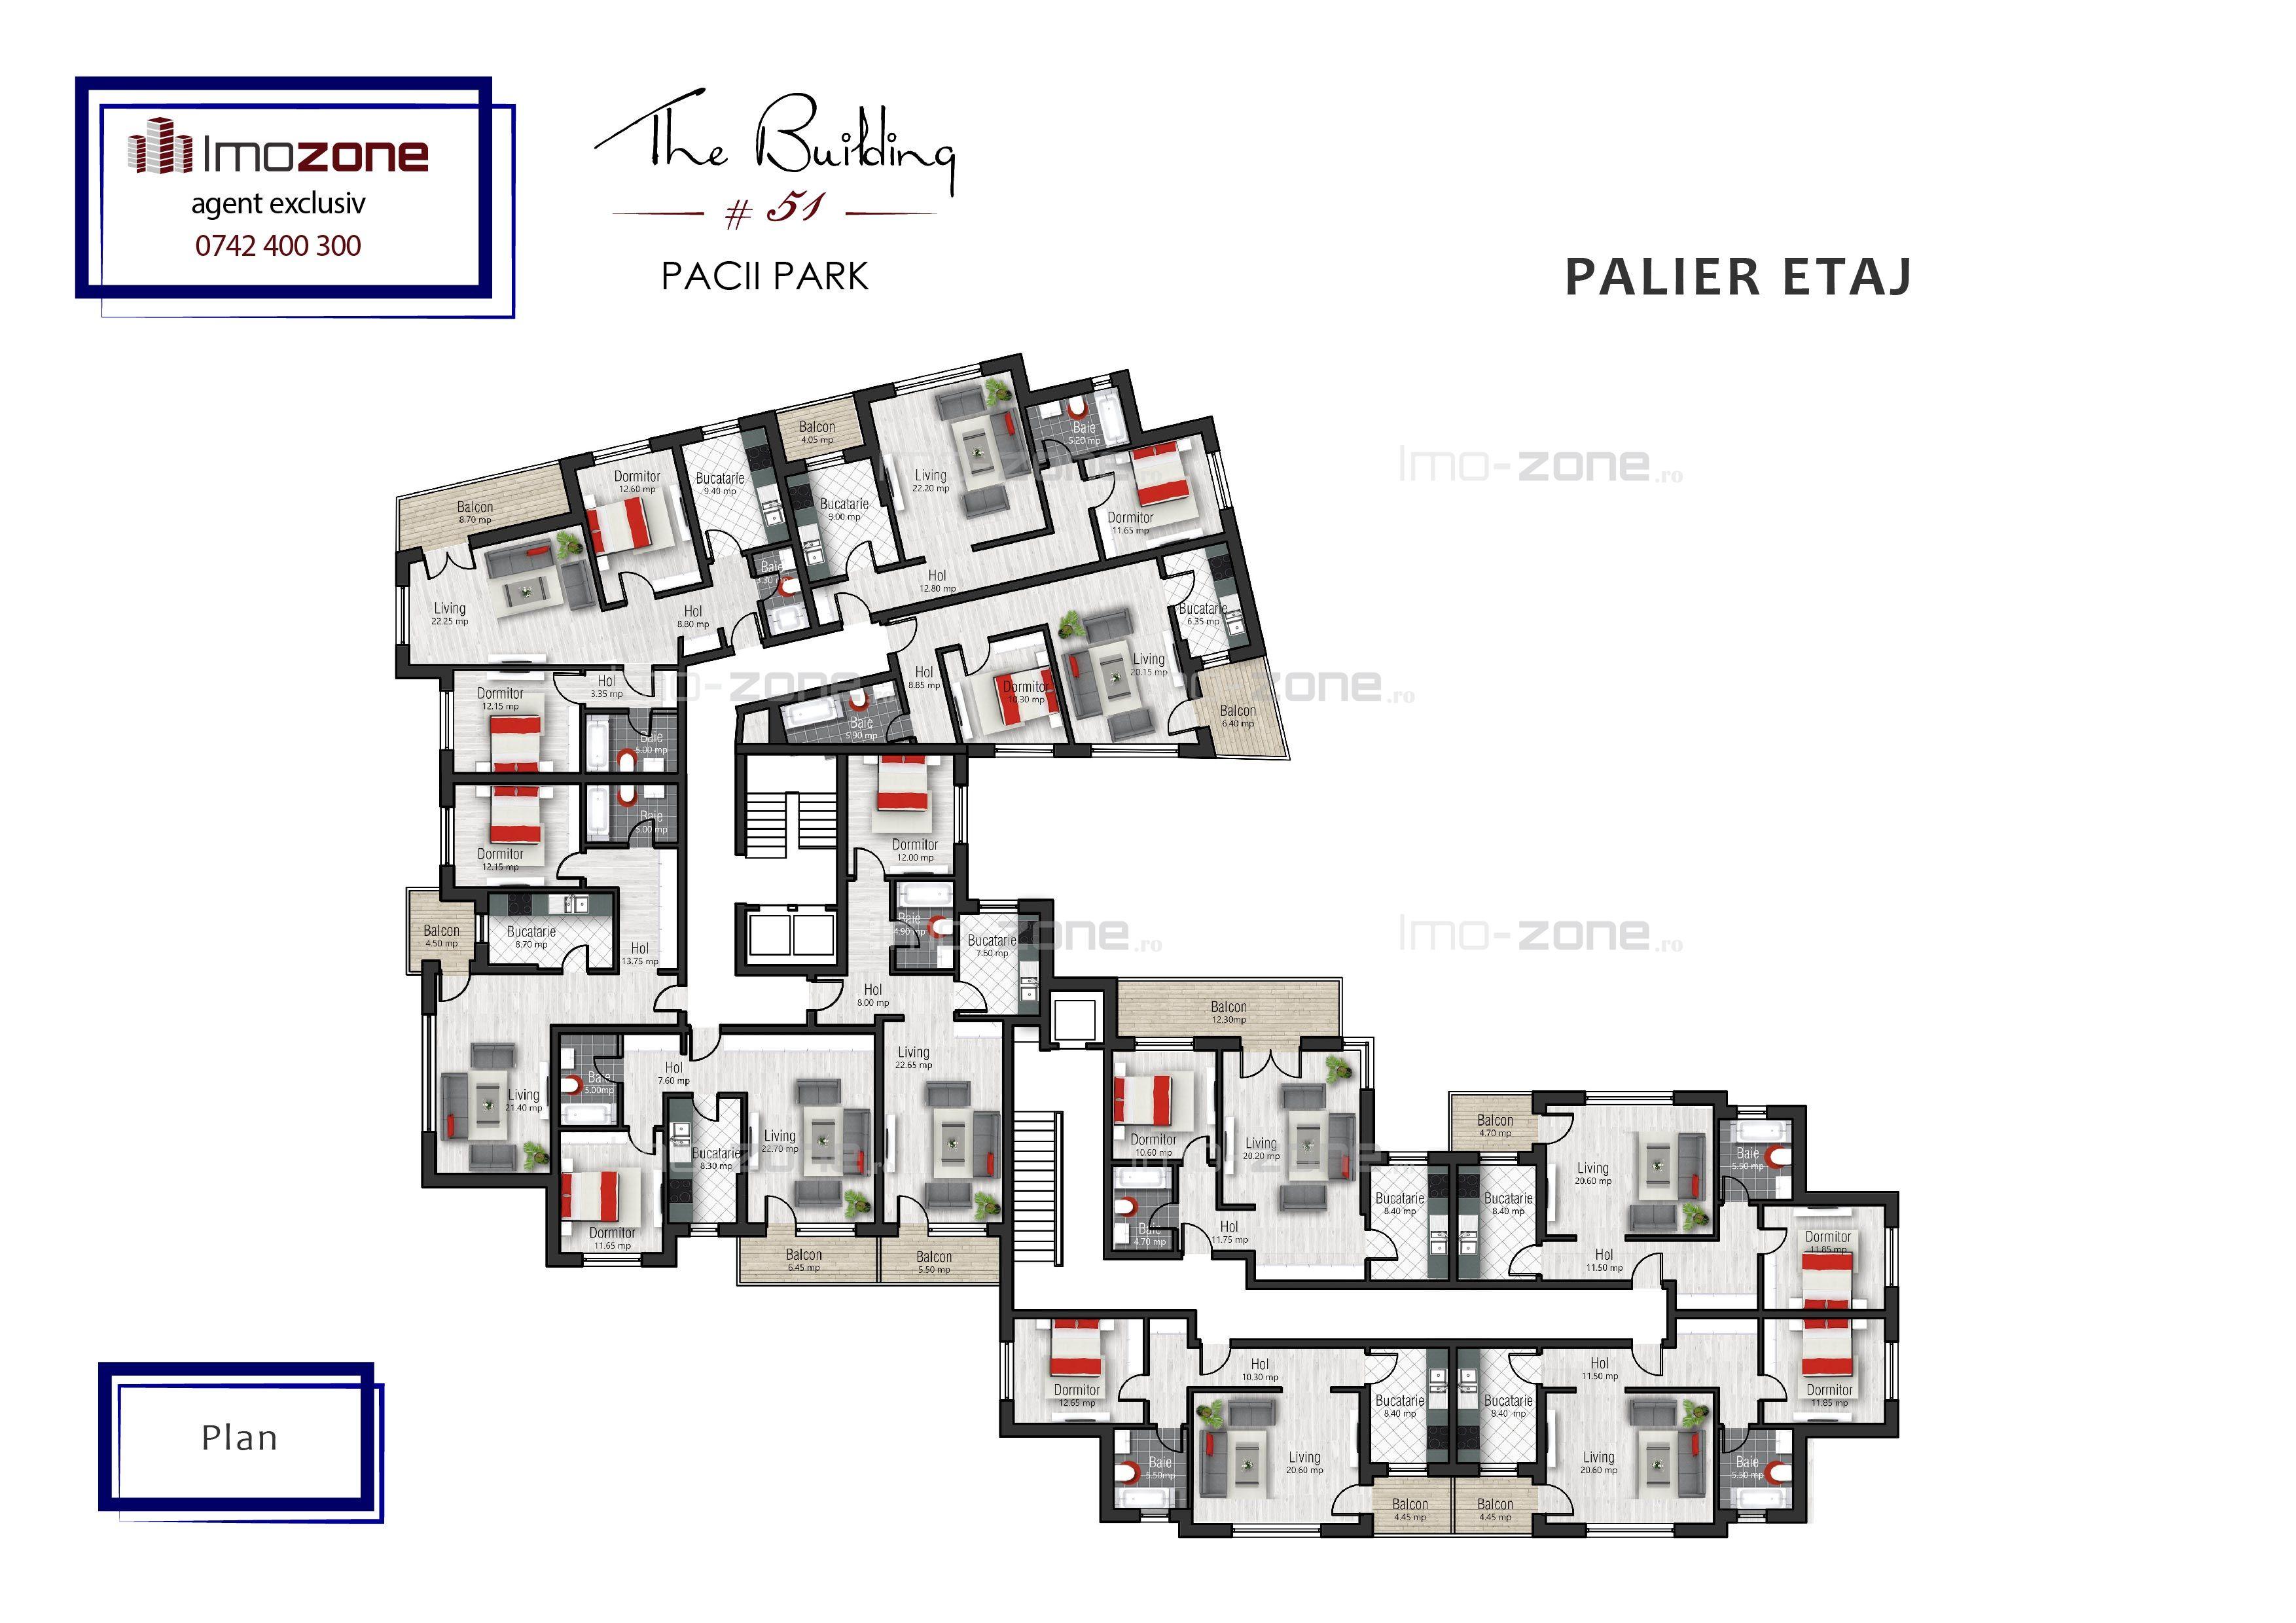 COMISION 0%, 2 camere, langa metrou, MILITARI - PACII, etajul 8, 68 mp